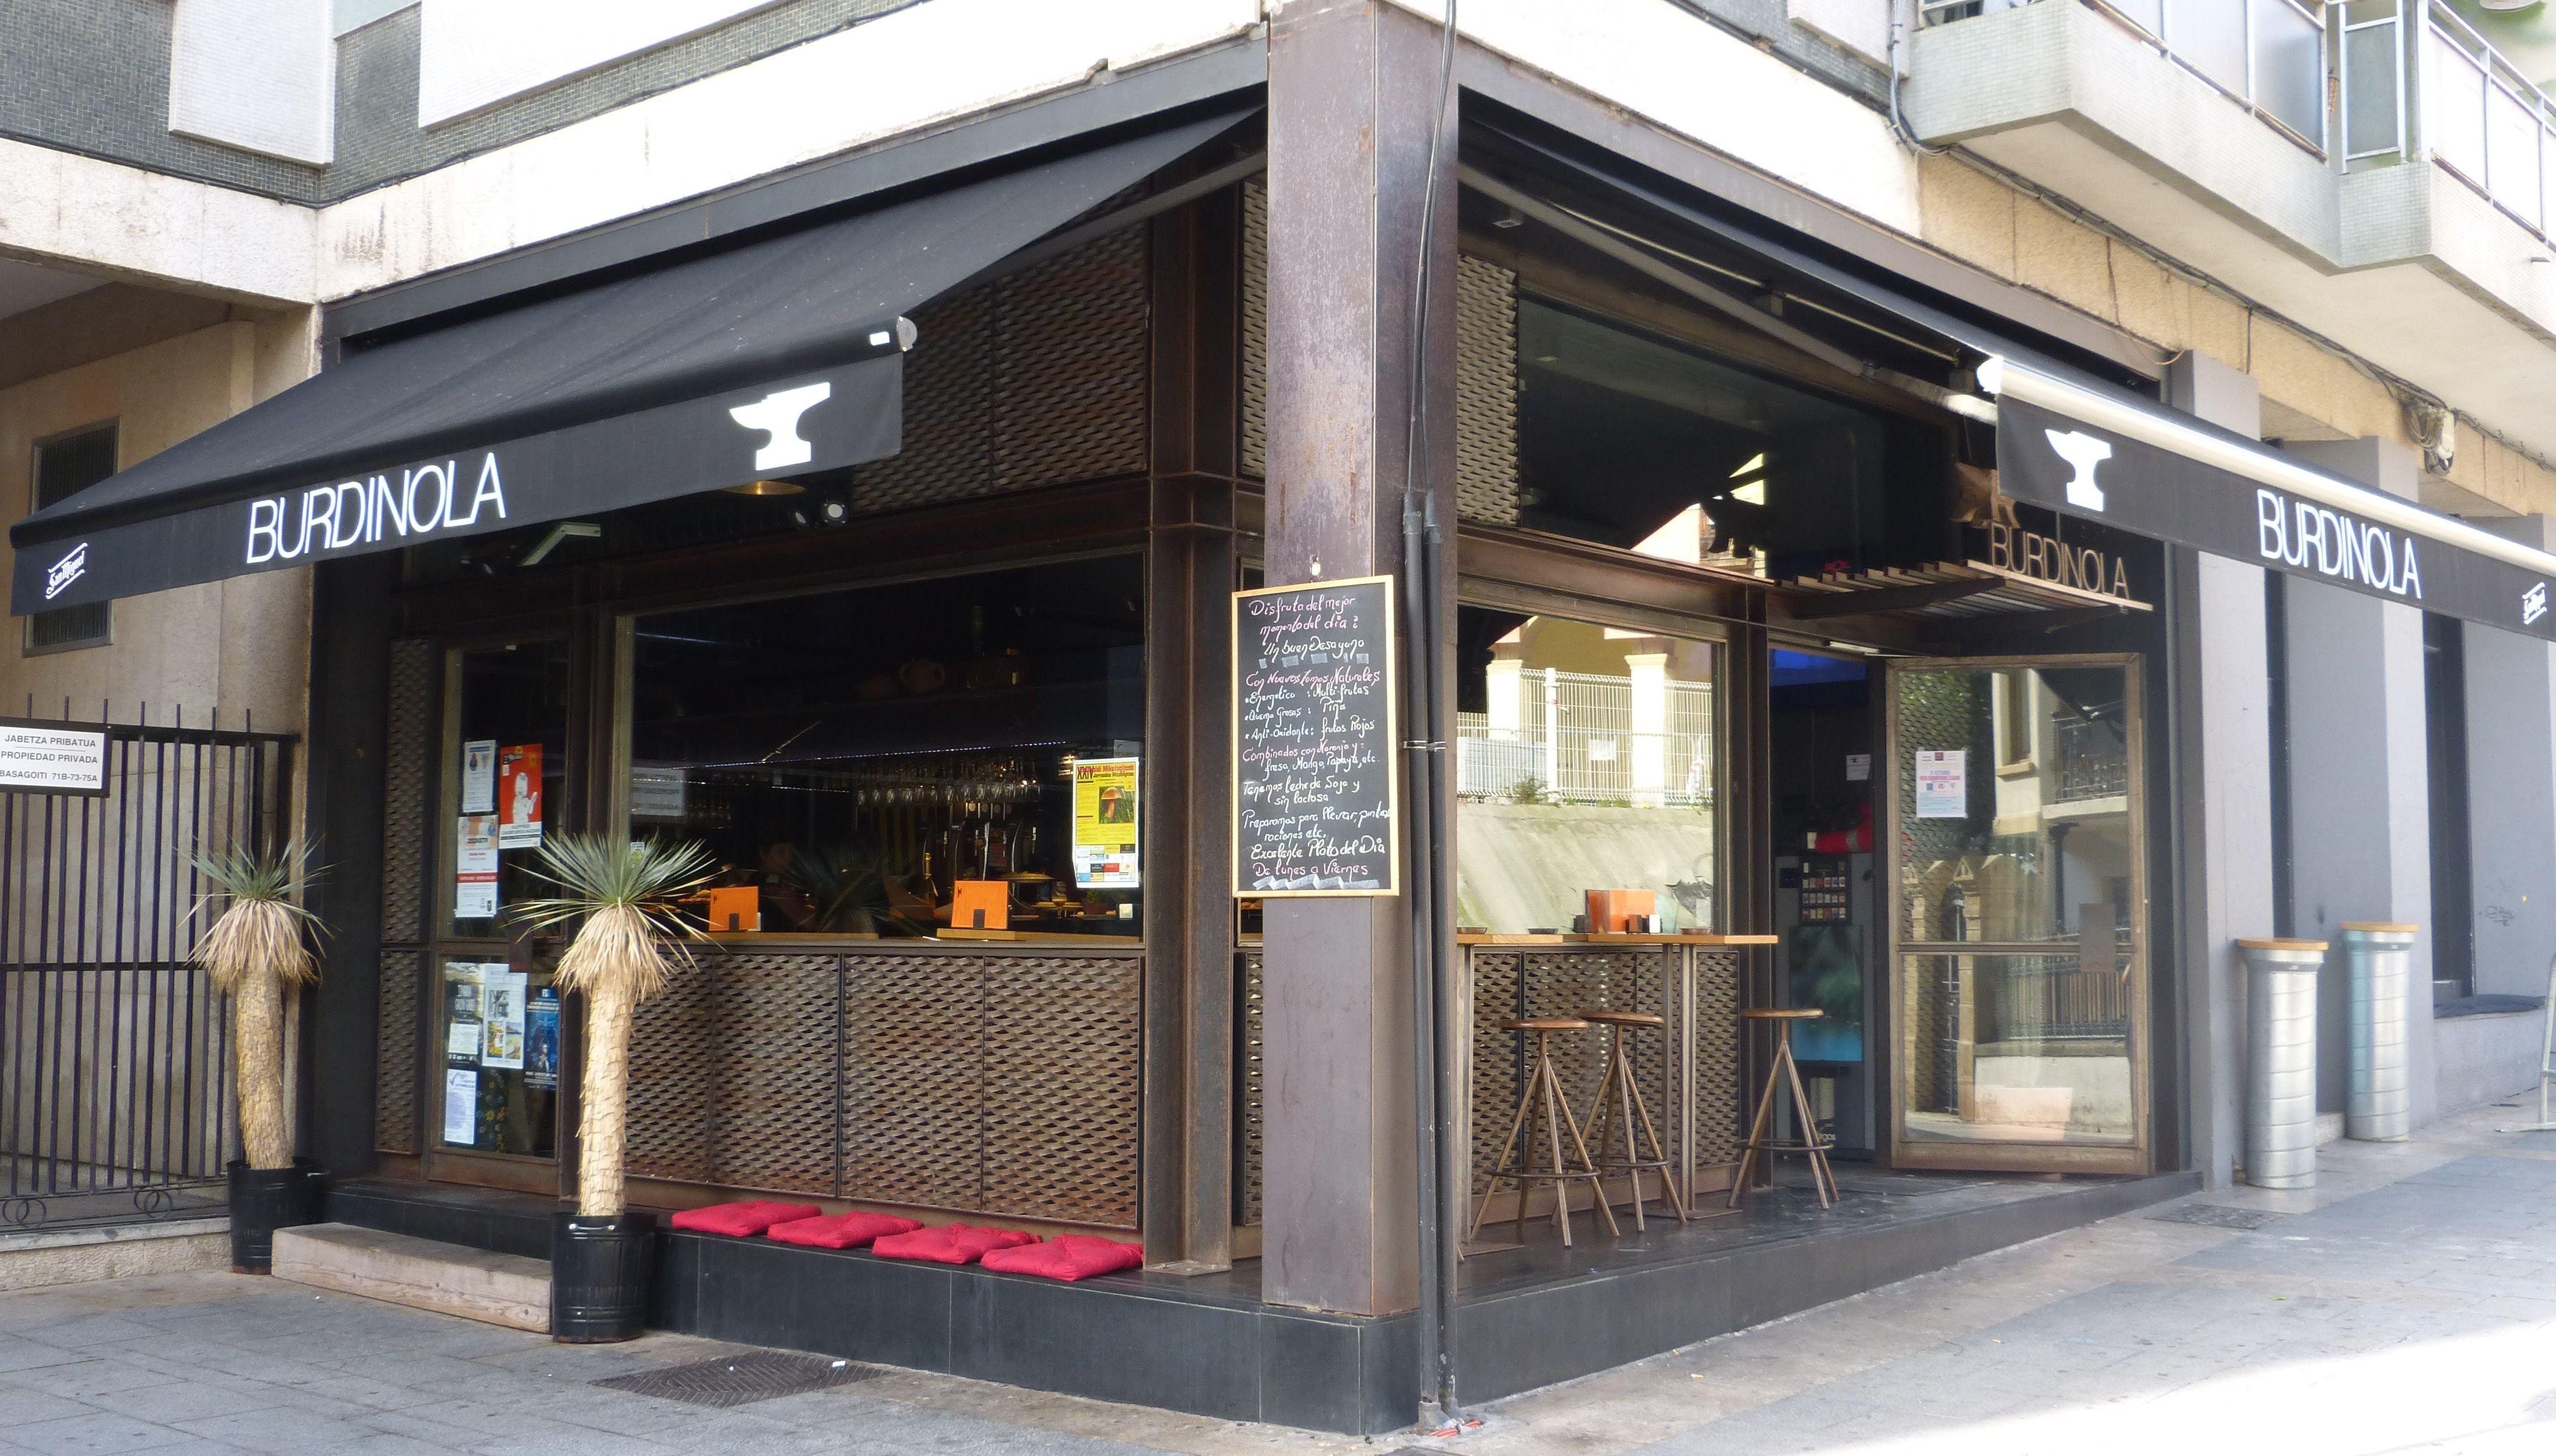 BURDINOLA Avda. Basagoiti, 75 (Plaza San Nikolas) 48991 ALGORTA/GETXO Tel. 946852137 www.facebook.com/pages/Burdinola/1529479350614655?fref=ts #bar #pintxos #cafe #getxo #getxotienepremio